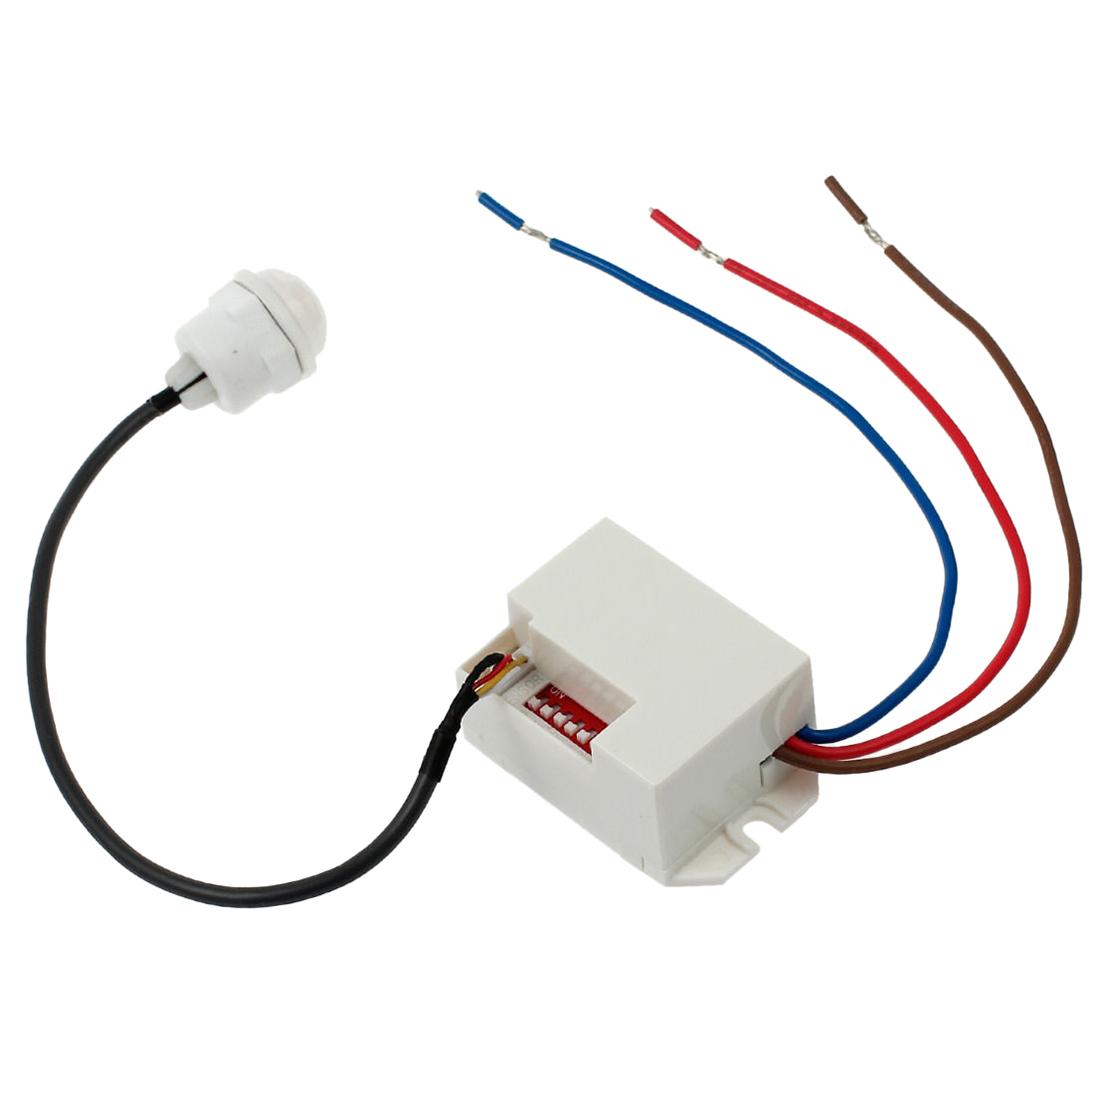 motion sensor 12v winch motor wiring diagram 360 degree recessed pir detector ceiling occupancy